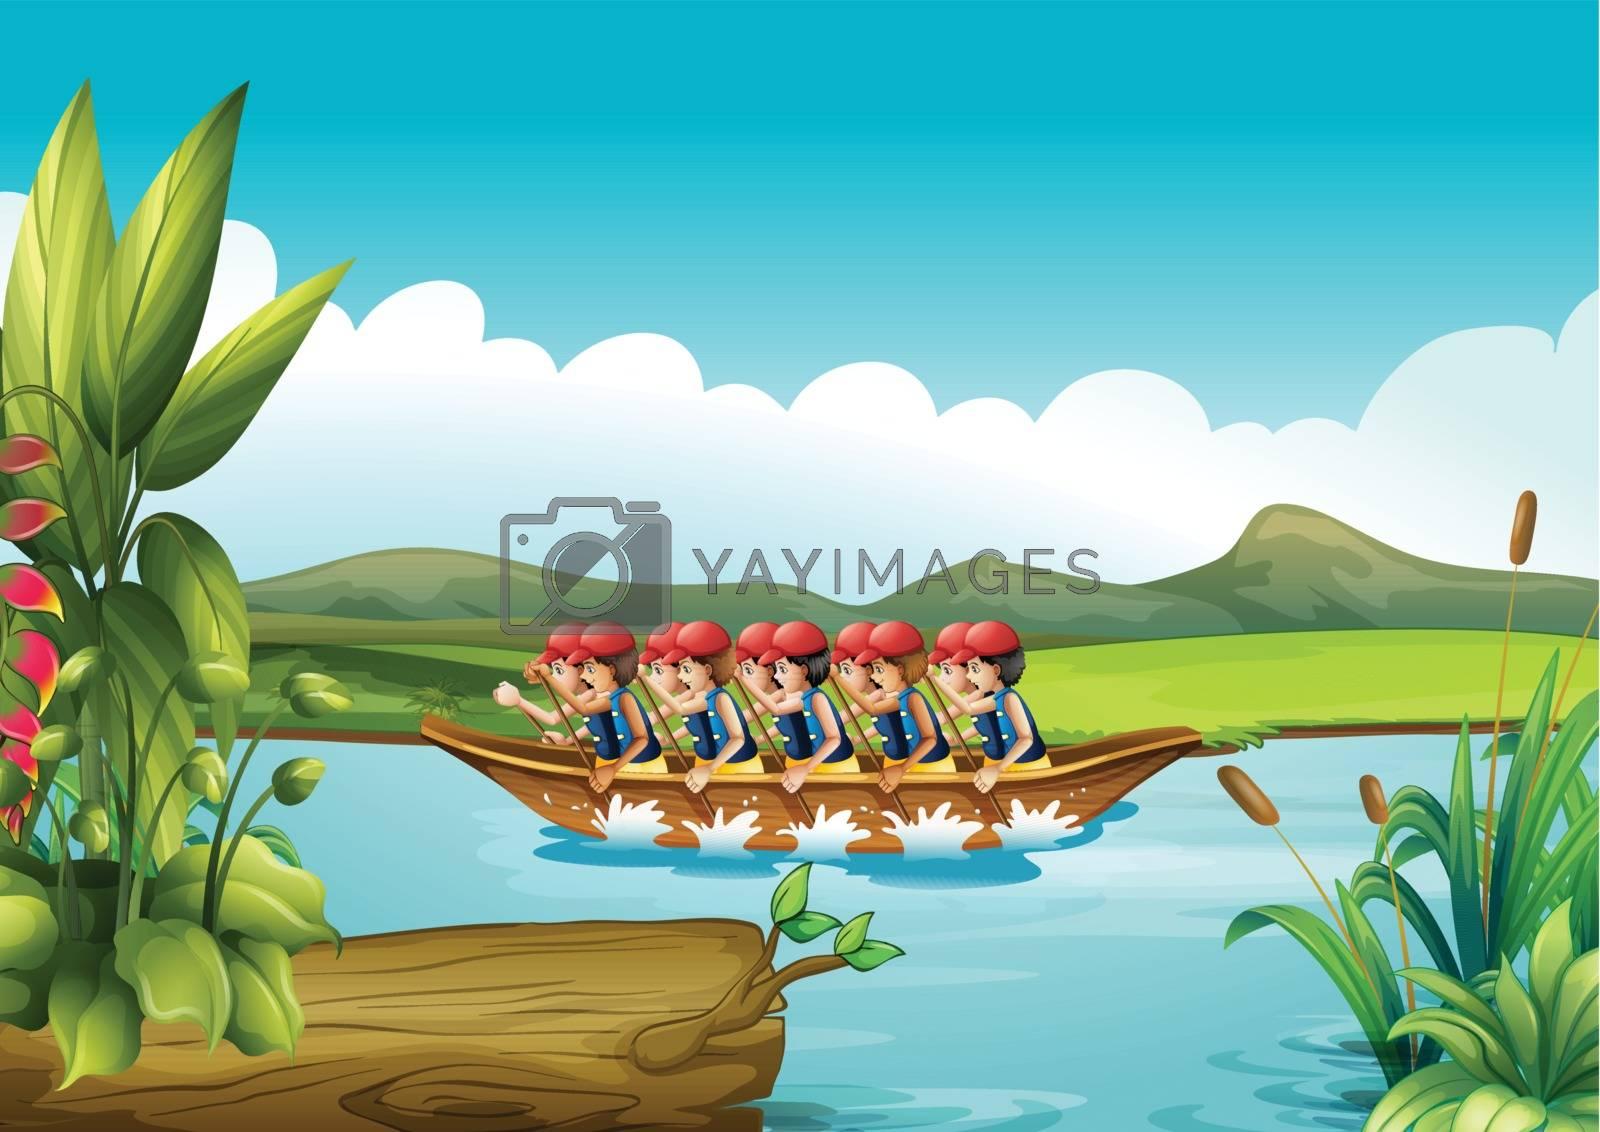 Illustration of a wooden boat full of men